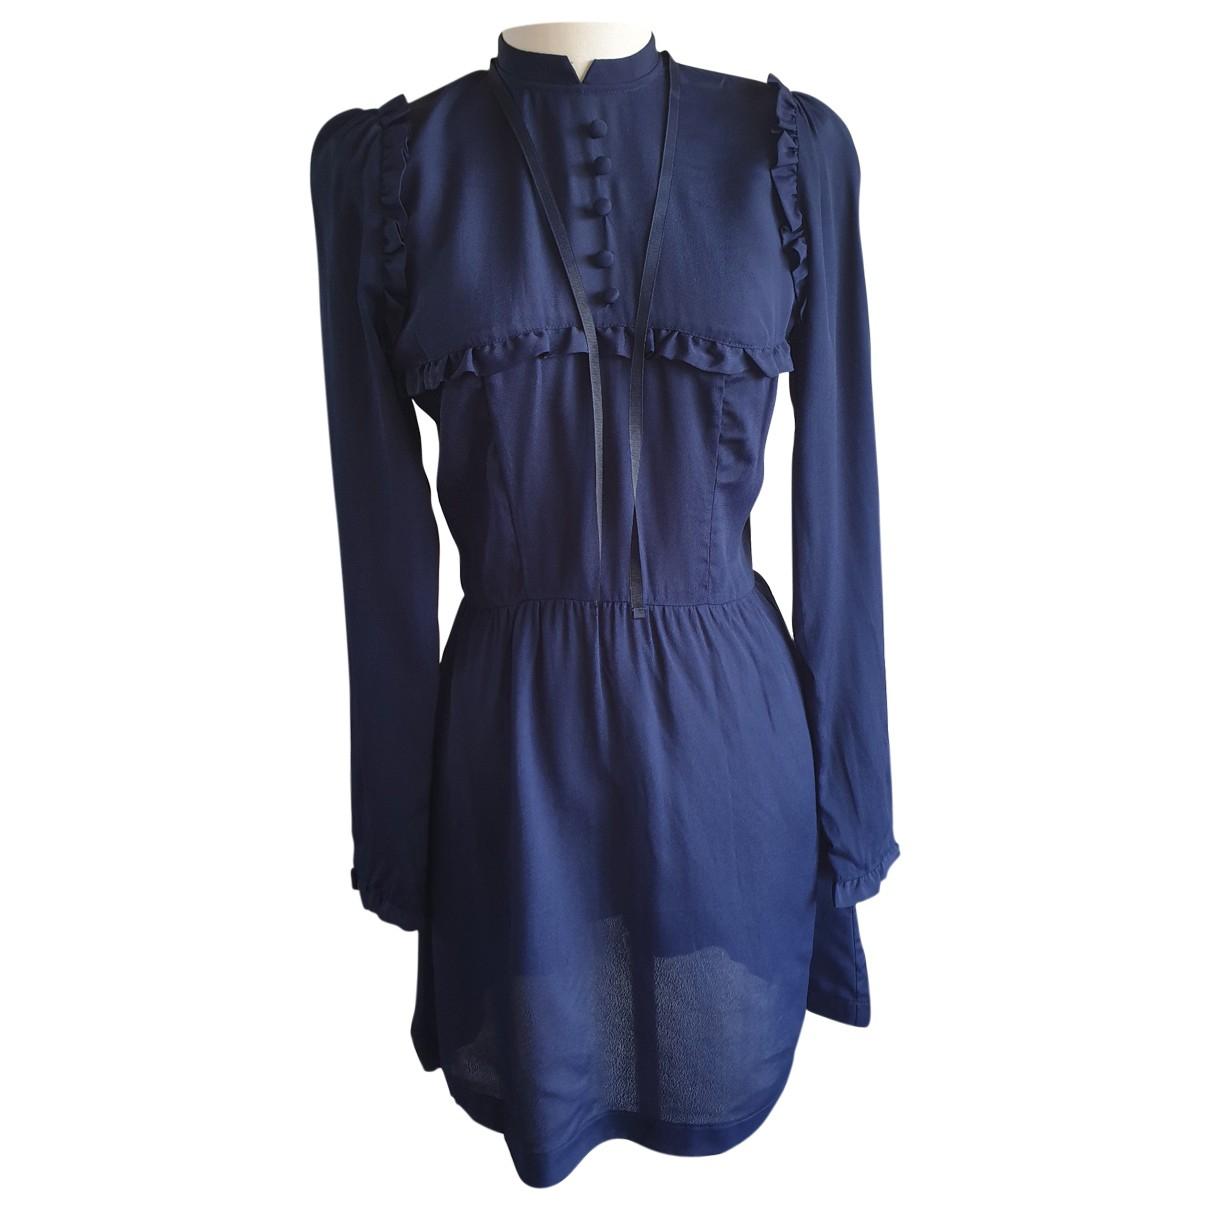 Reformation \N Blue dress for Women 2 US